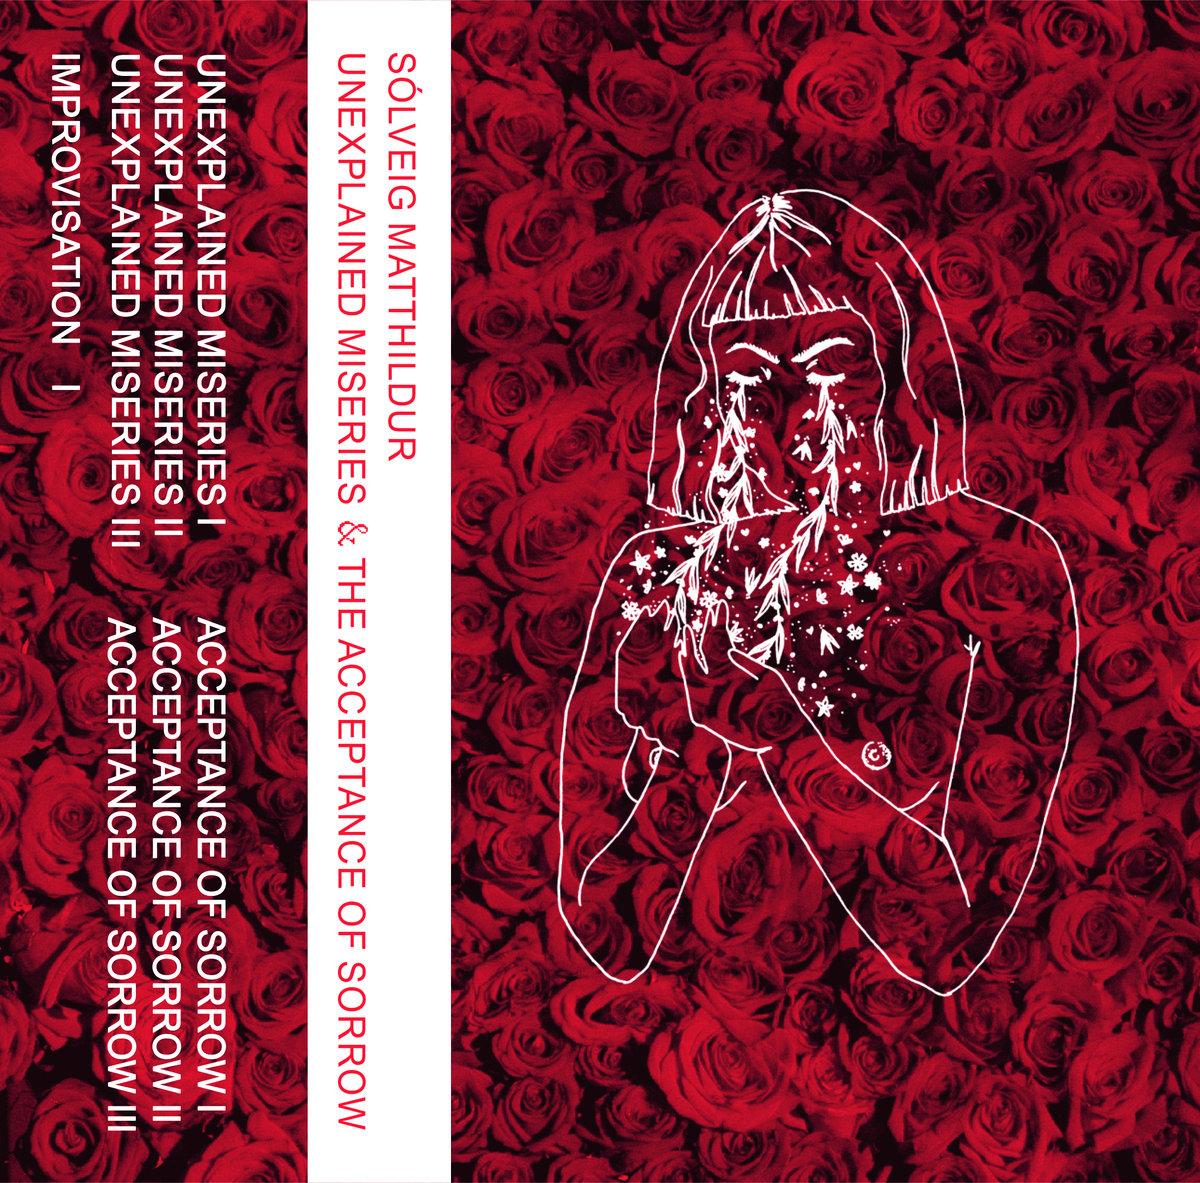 Sólveig Matthildur - Unexplained miseries & the acceptance of sorrow (LP; 2017)